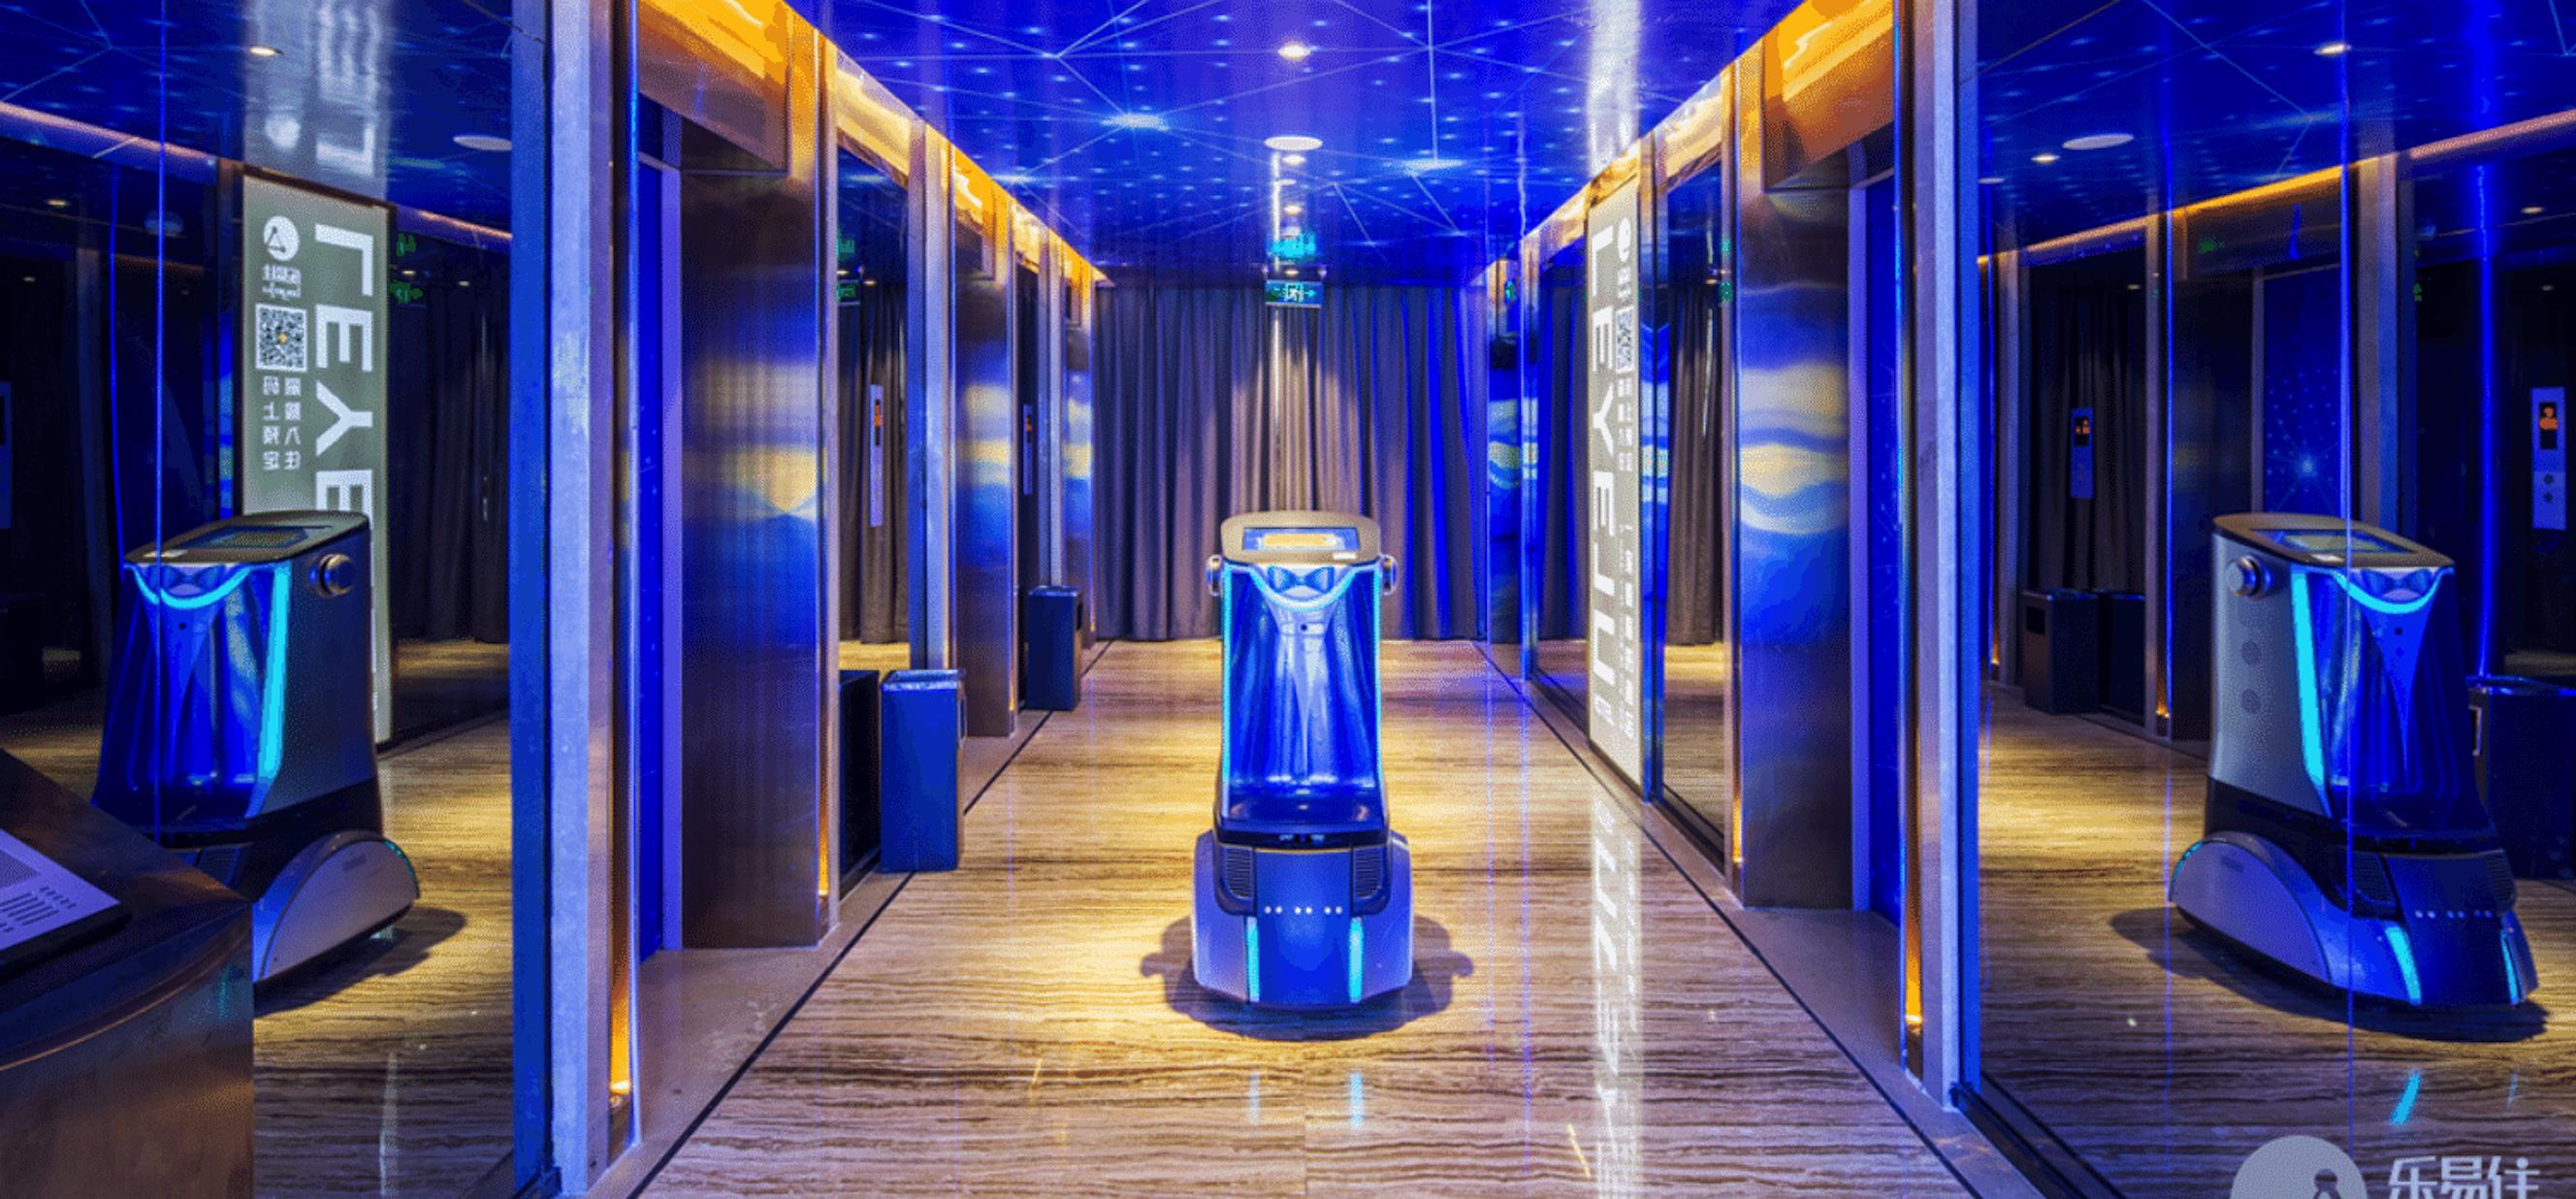 Leyeju hotel robot